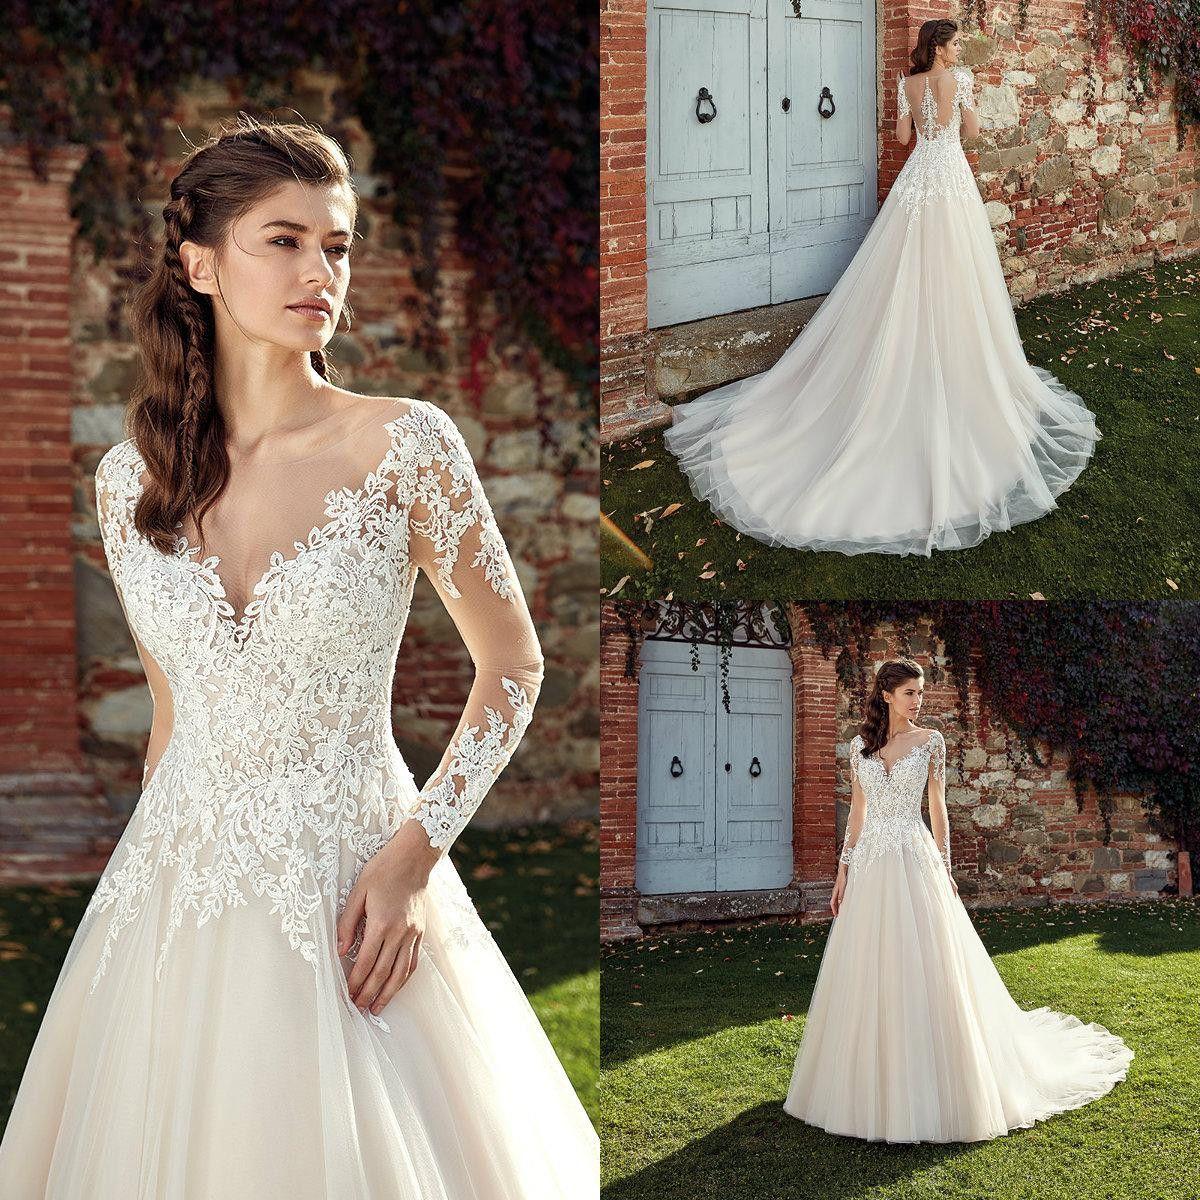 8594e36bb42d5 Discount Eddy K 2019 Wedding Dresses Jewel Neck Long Sleeves Lace Appliques Bridal  Gowns Sweep Train Boho A Line Wedding Dress Robe De Mariee Second Hand ...